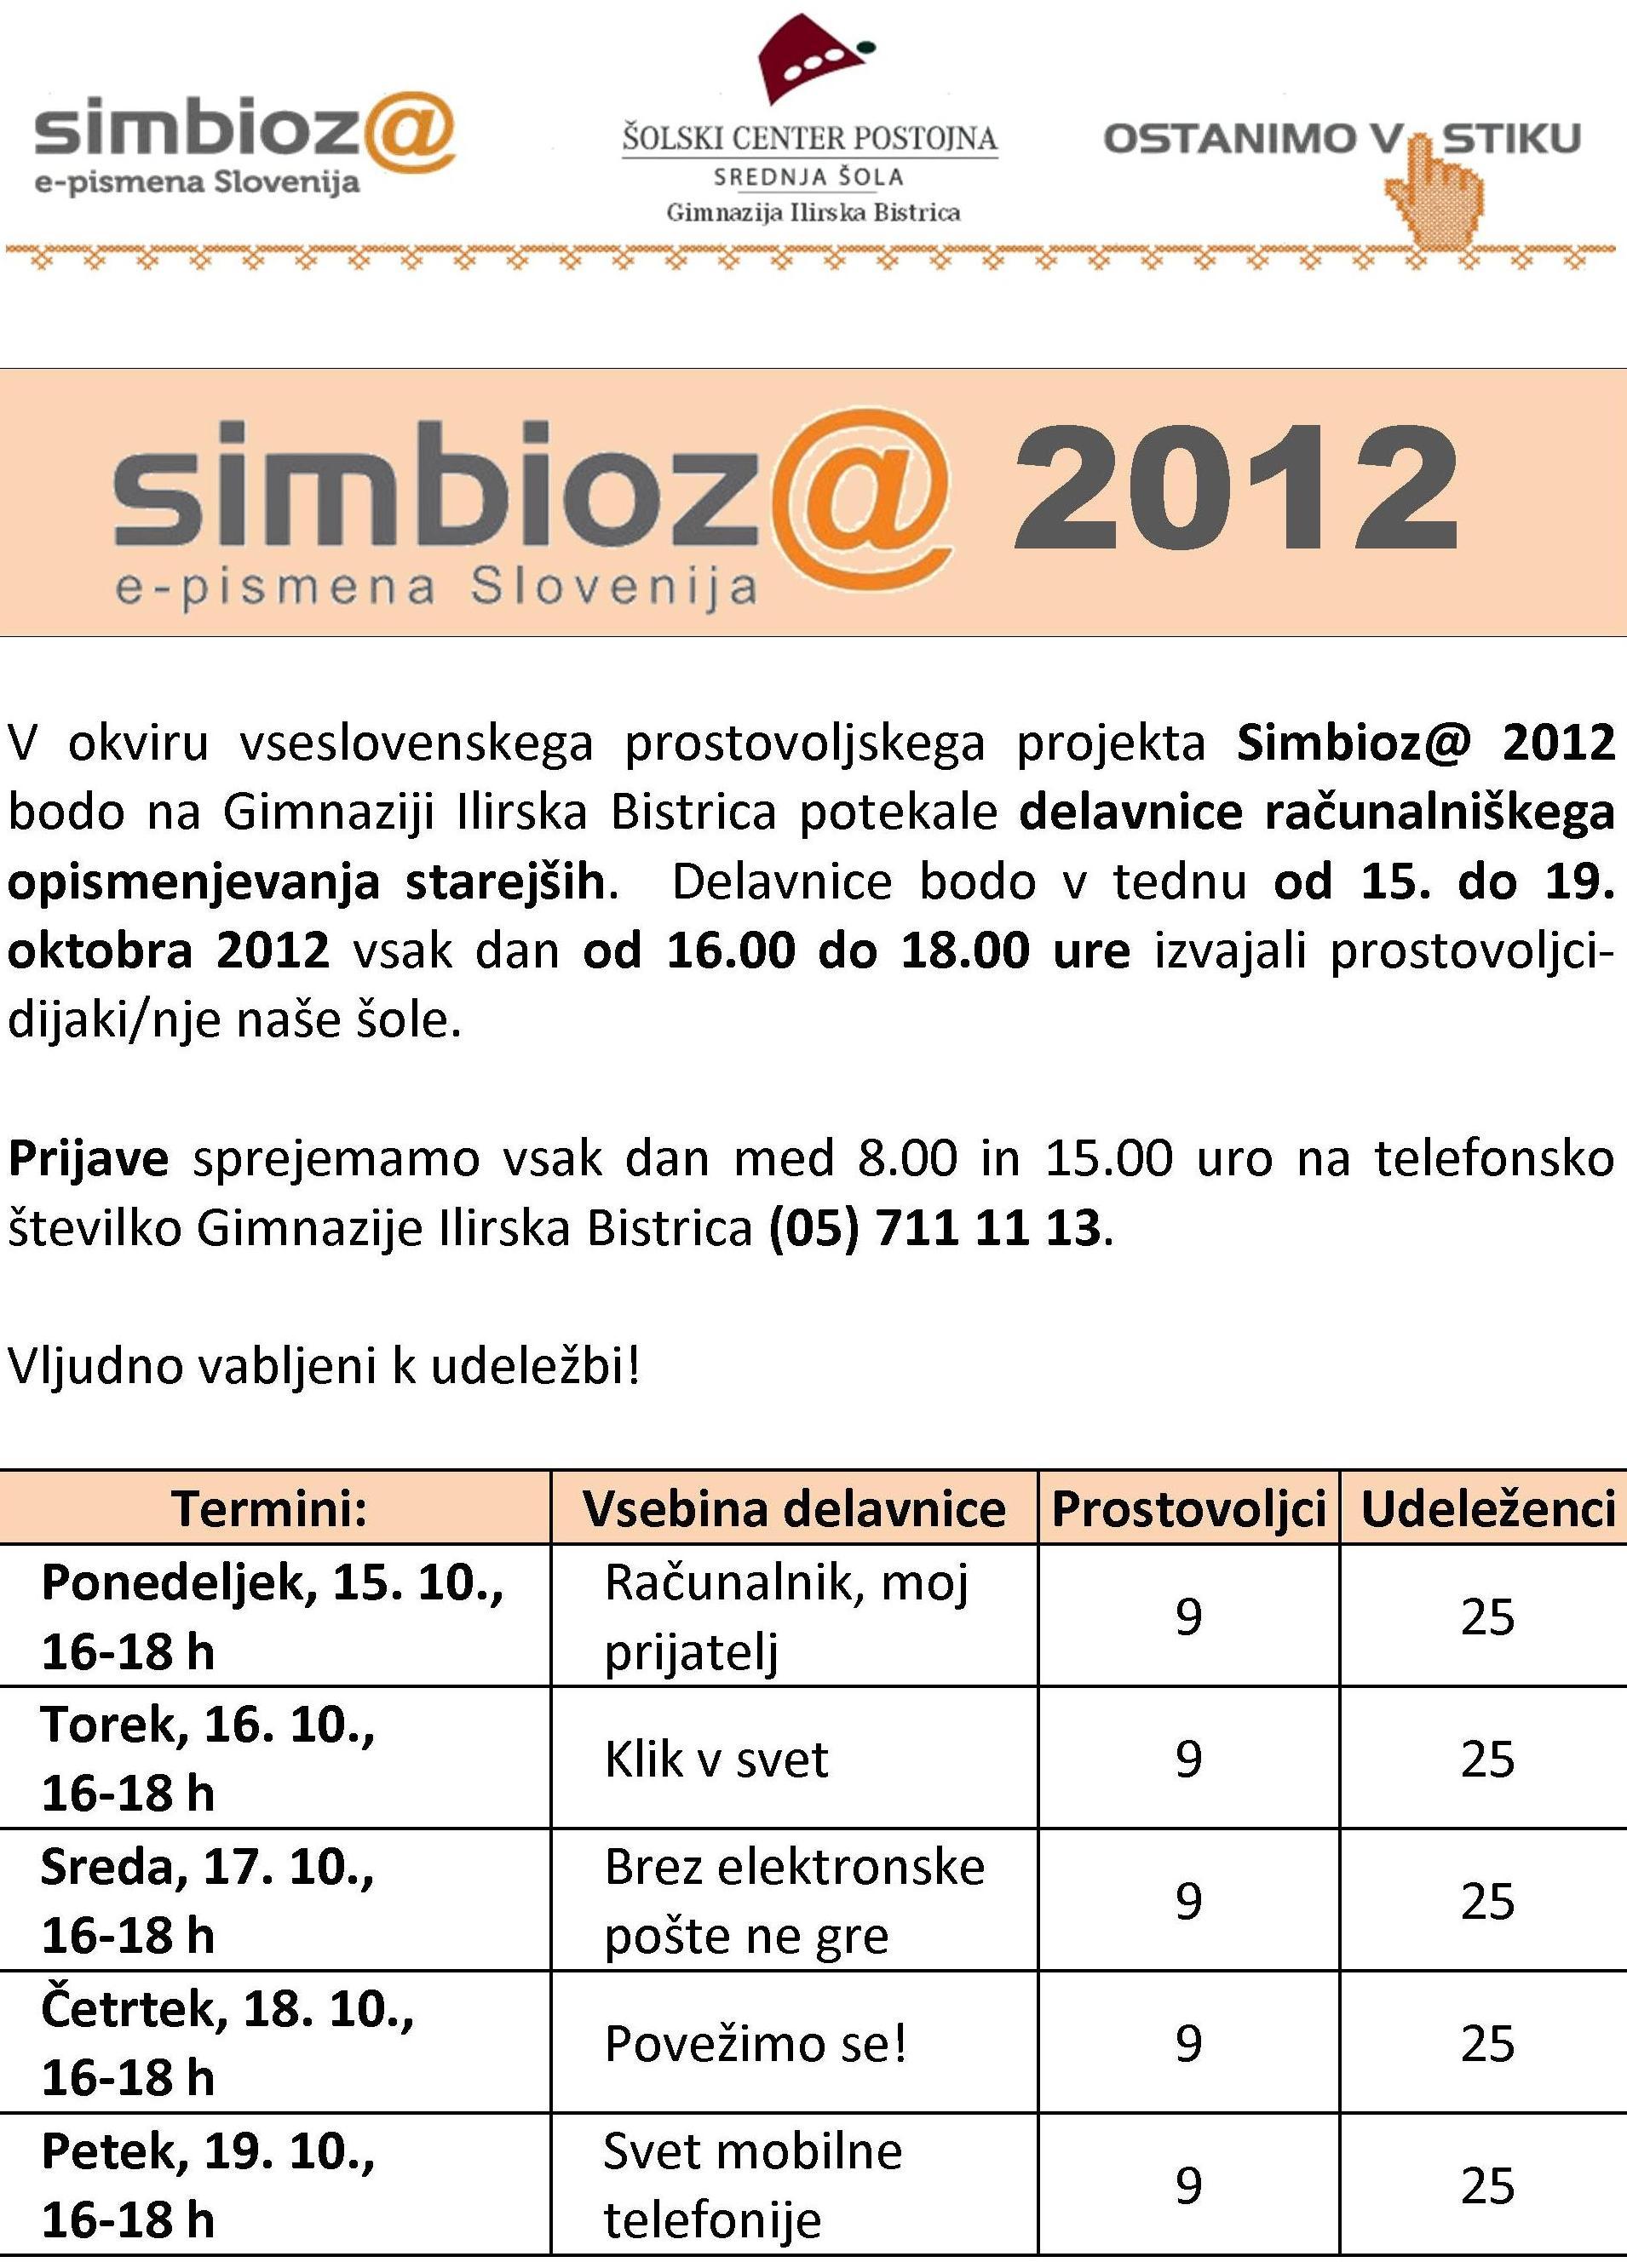 Simbioz p01a